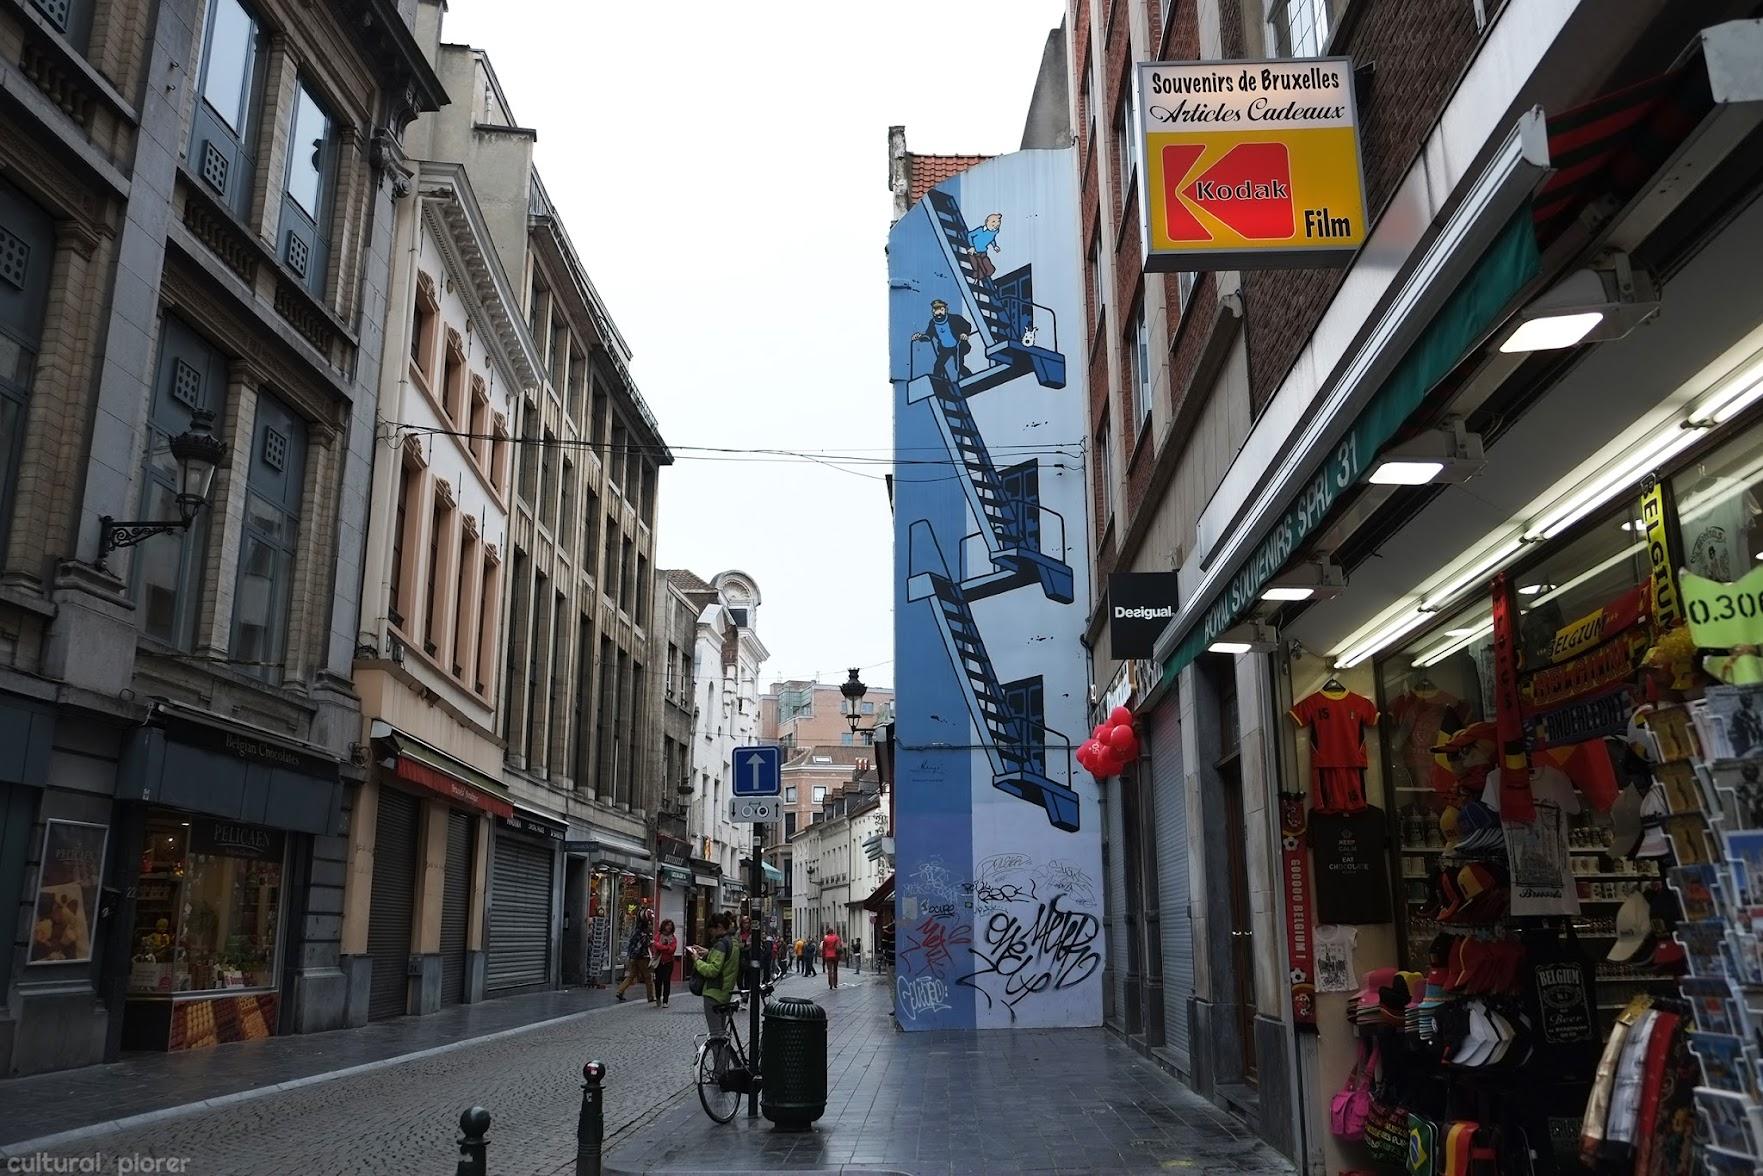 Tintin by Herge Brussels Street Art